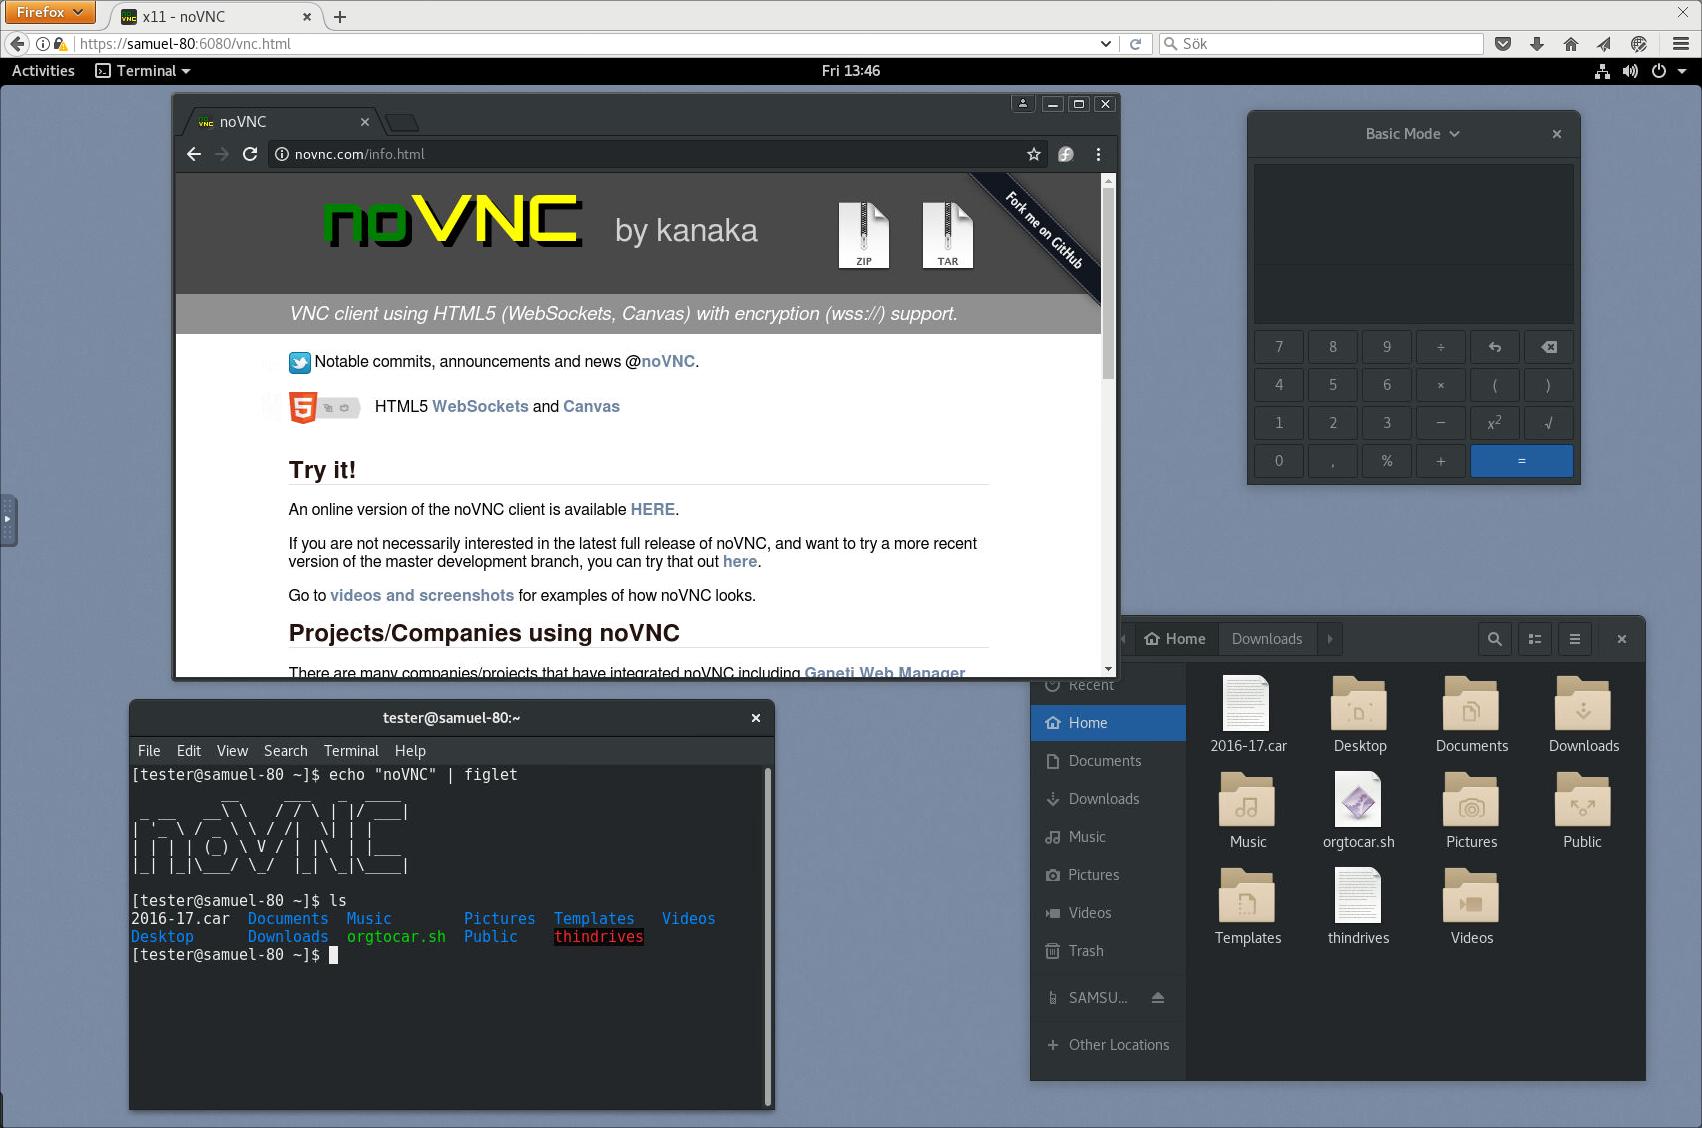 noVNC Videos and Screenshots